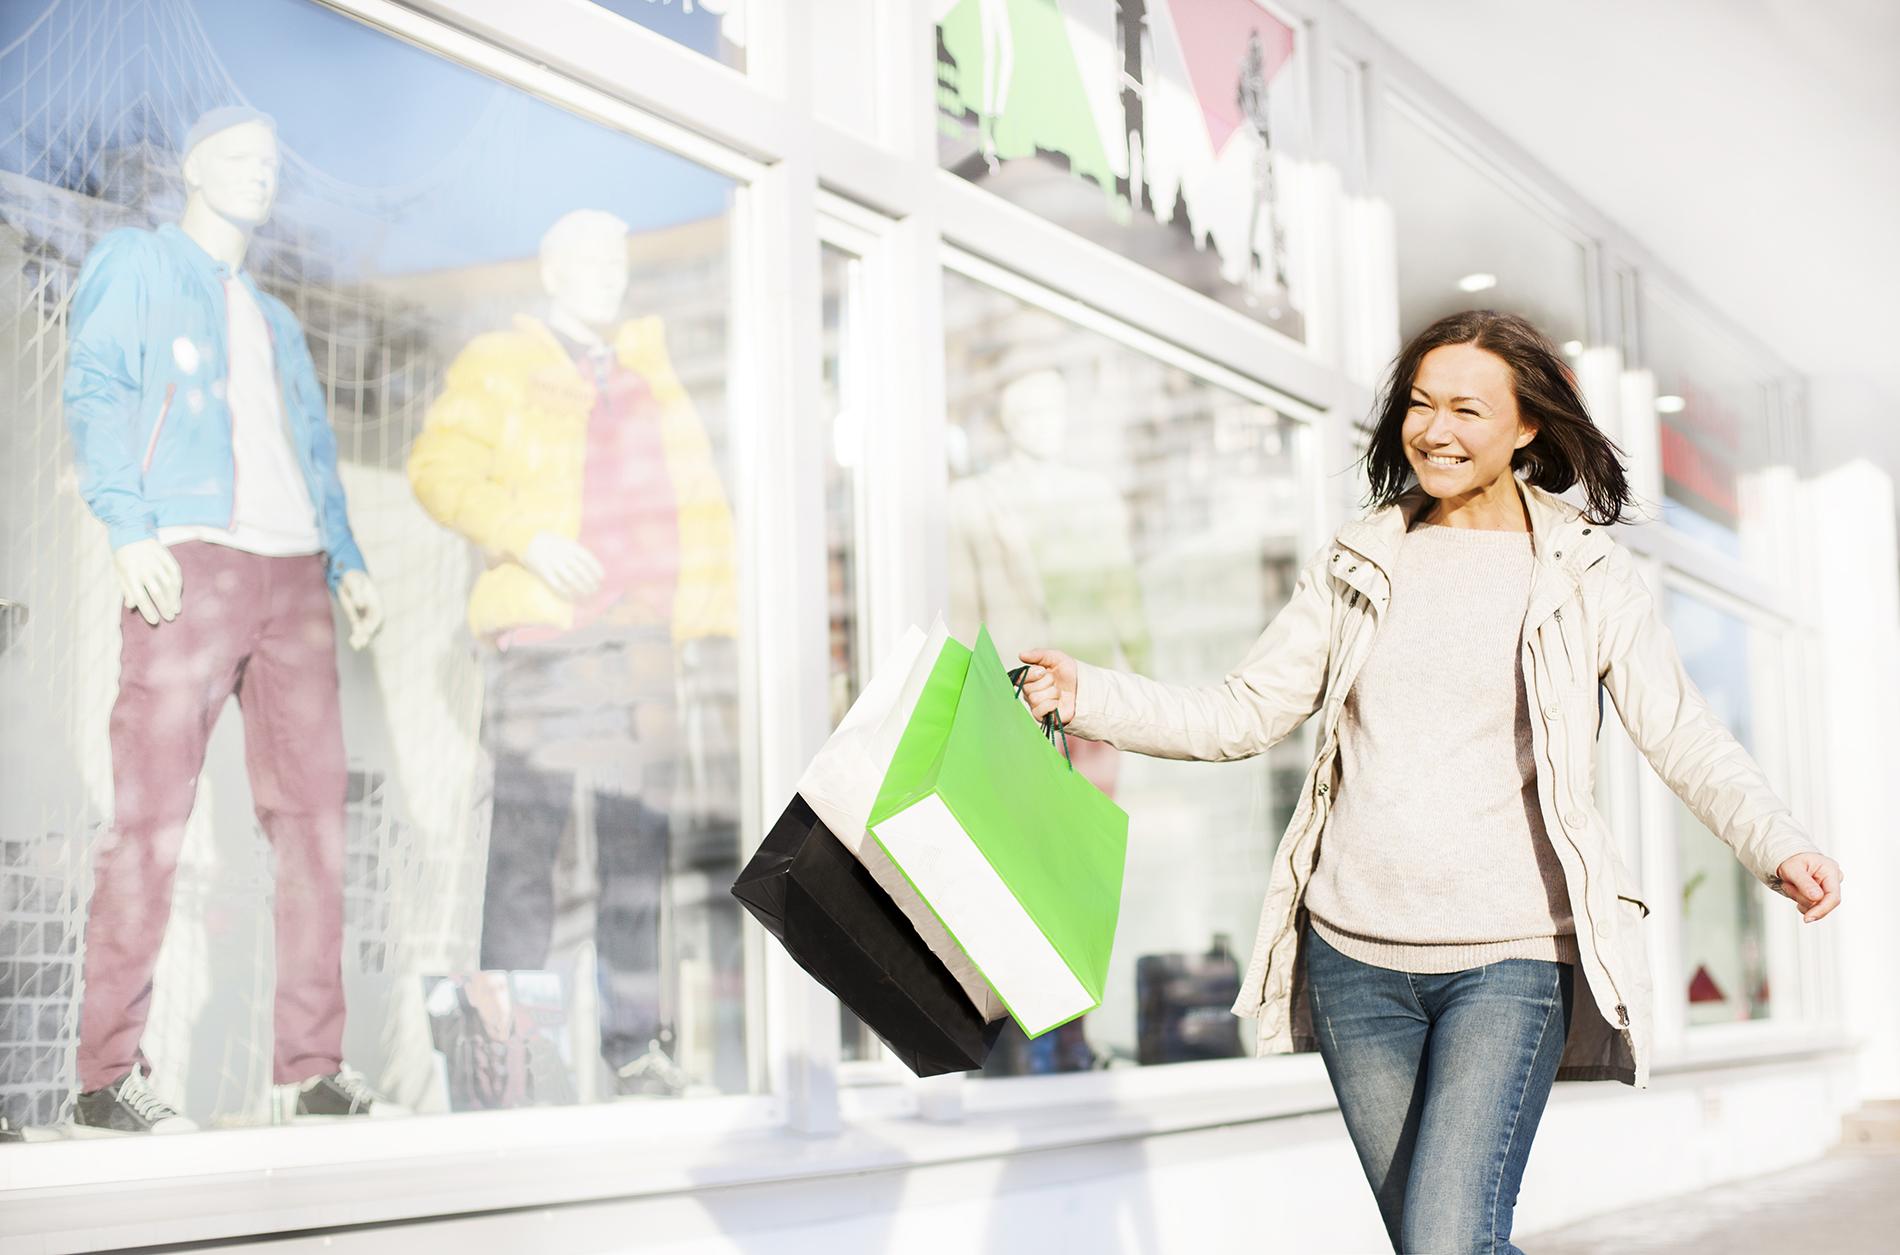 millennial consumer shopping